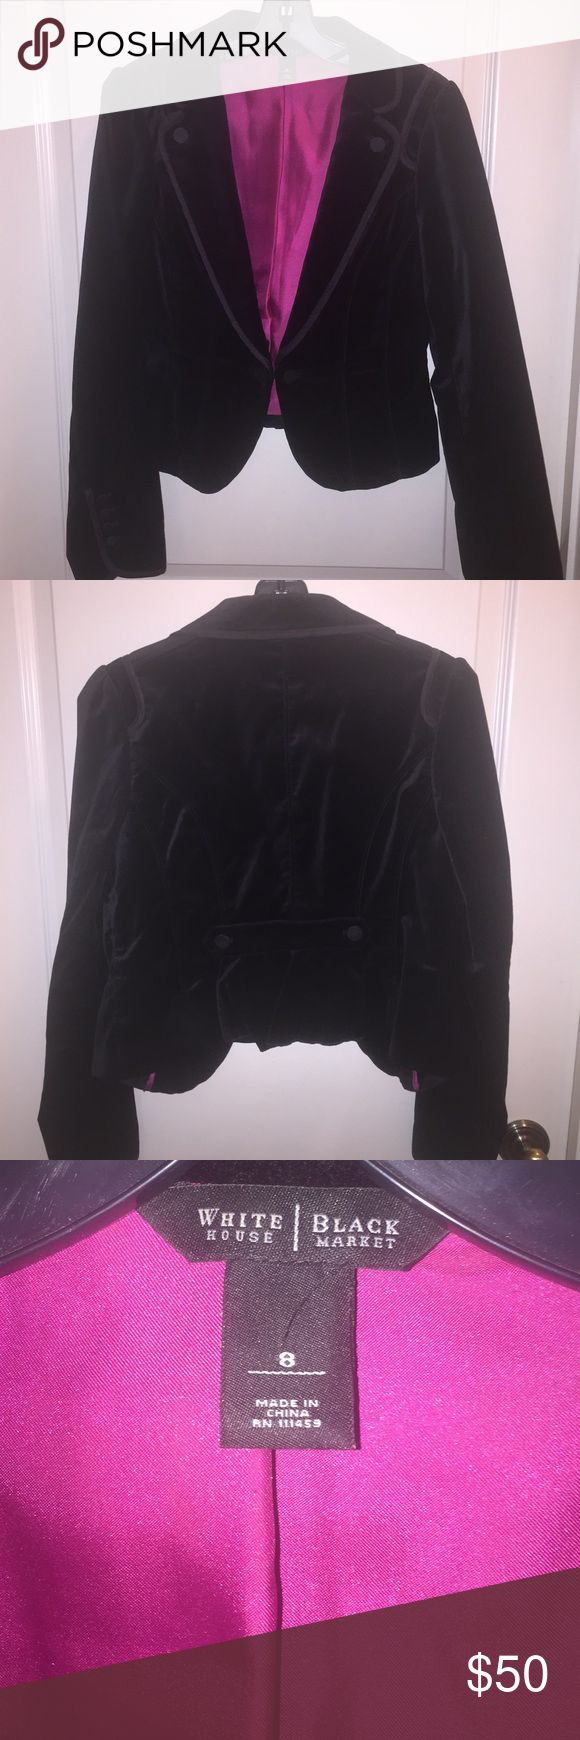 White House Black Market black velvet jacket Beautiful black velvet short jacket with beautiful hot pink satin lining.....worn 2 times...in great condition! White House Black Market Jackets & Coats Blazers